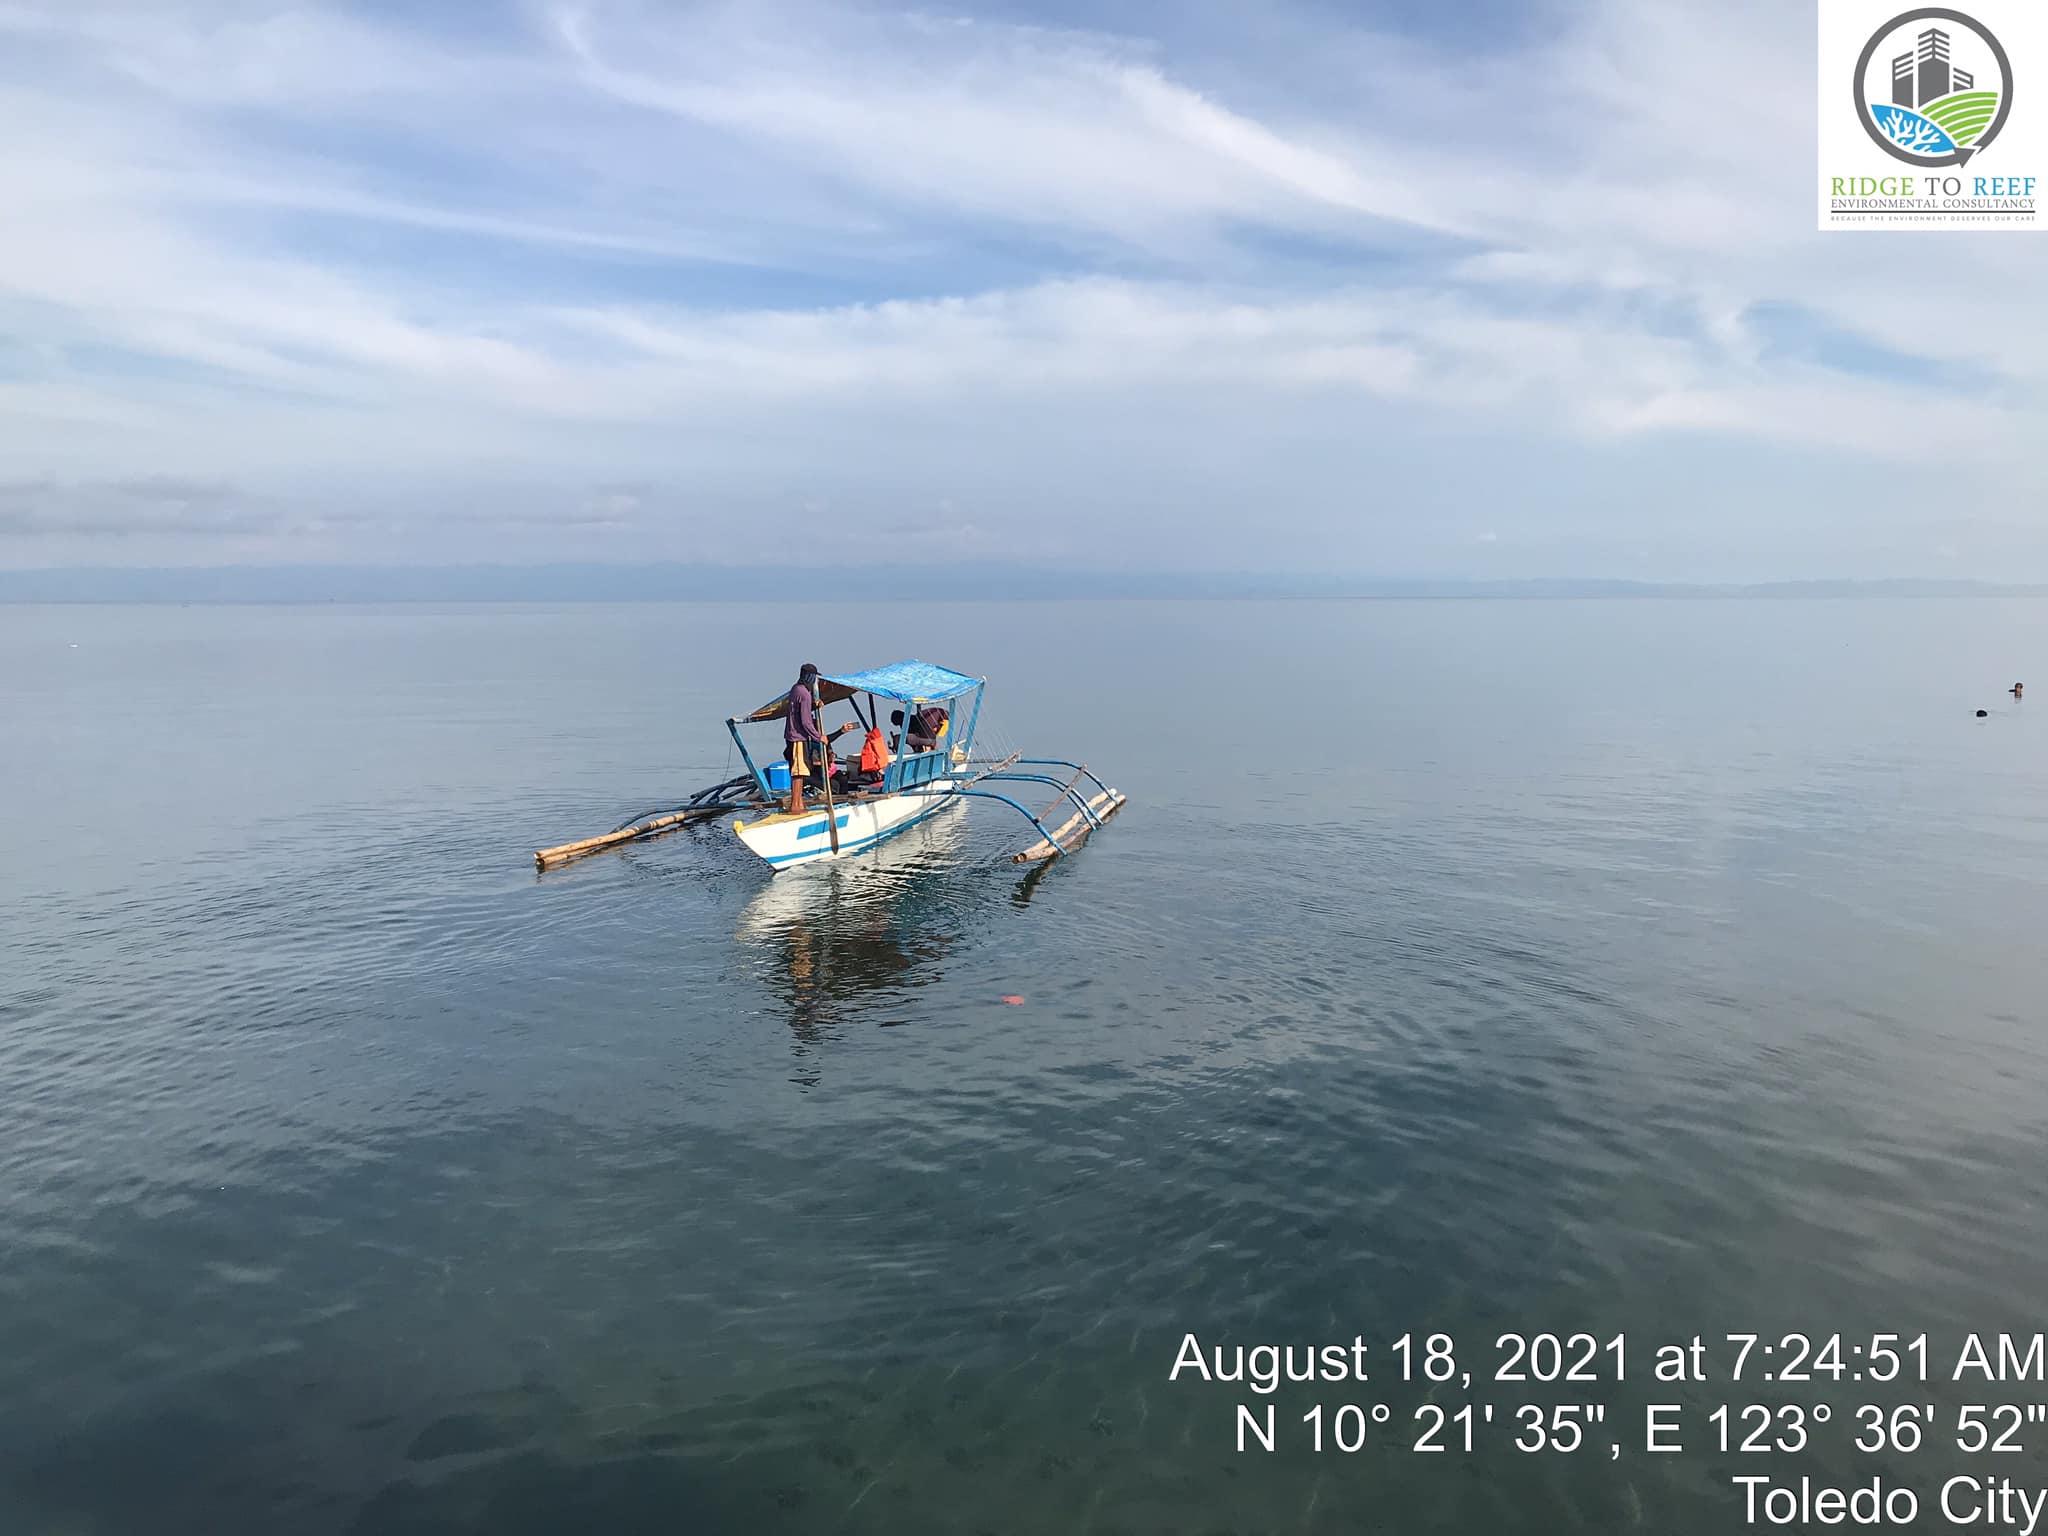 R2R's Team conducts Marine Biodiversity Assessment at Tañon Strait.